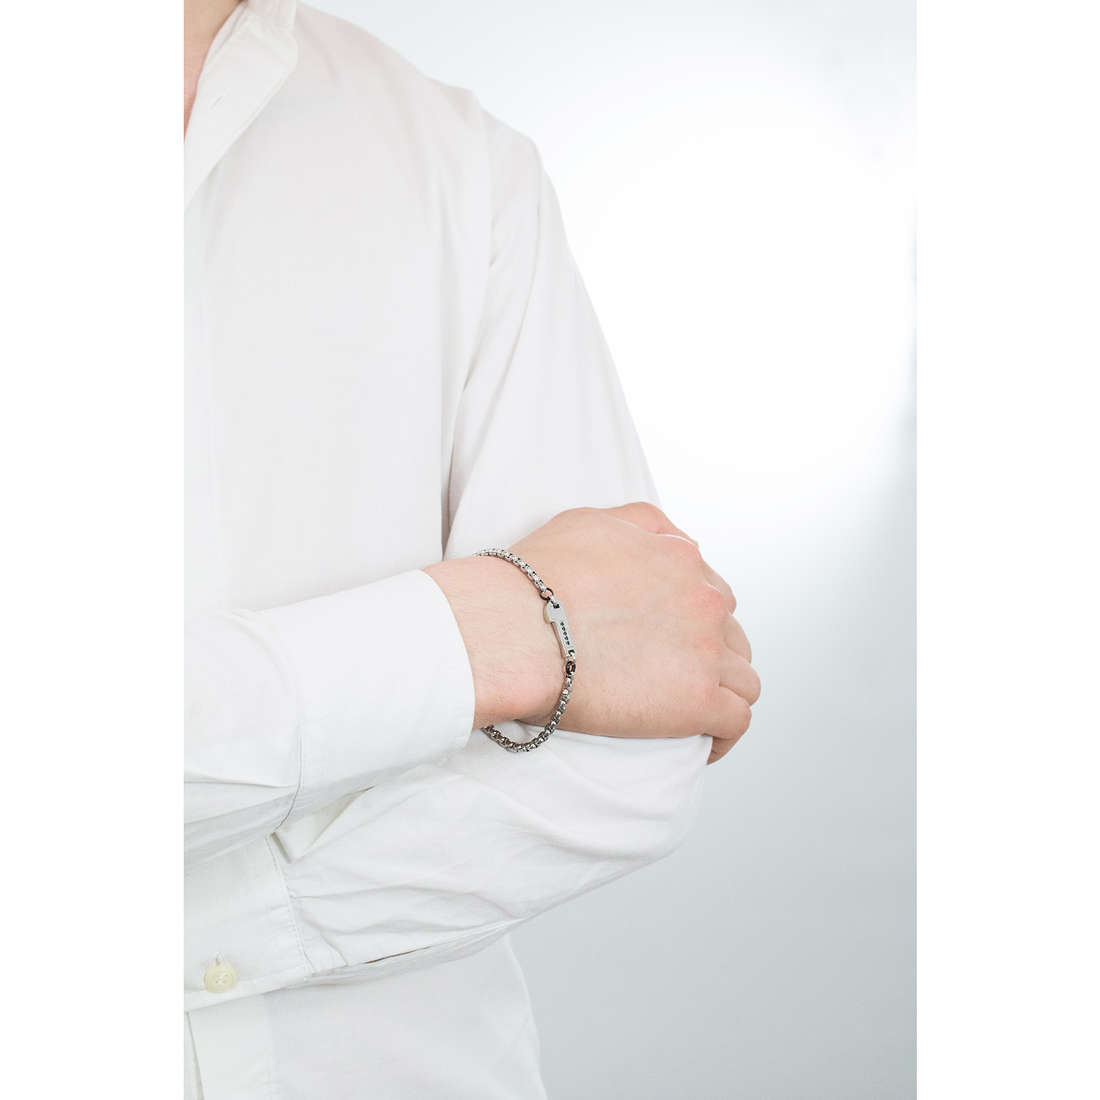 Luca Barra bracciali uomo LBBA488 indosso